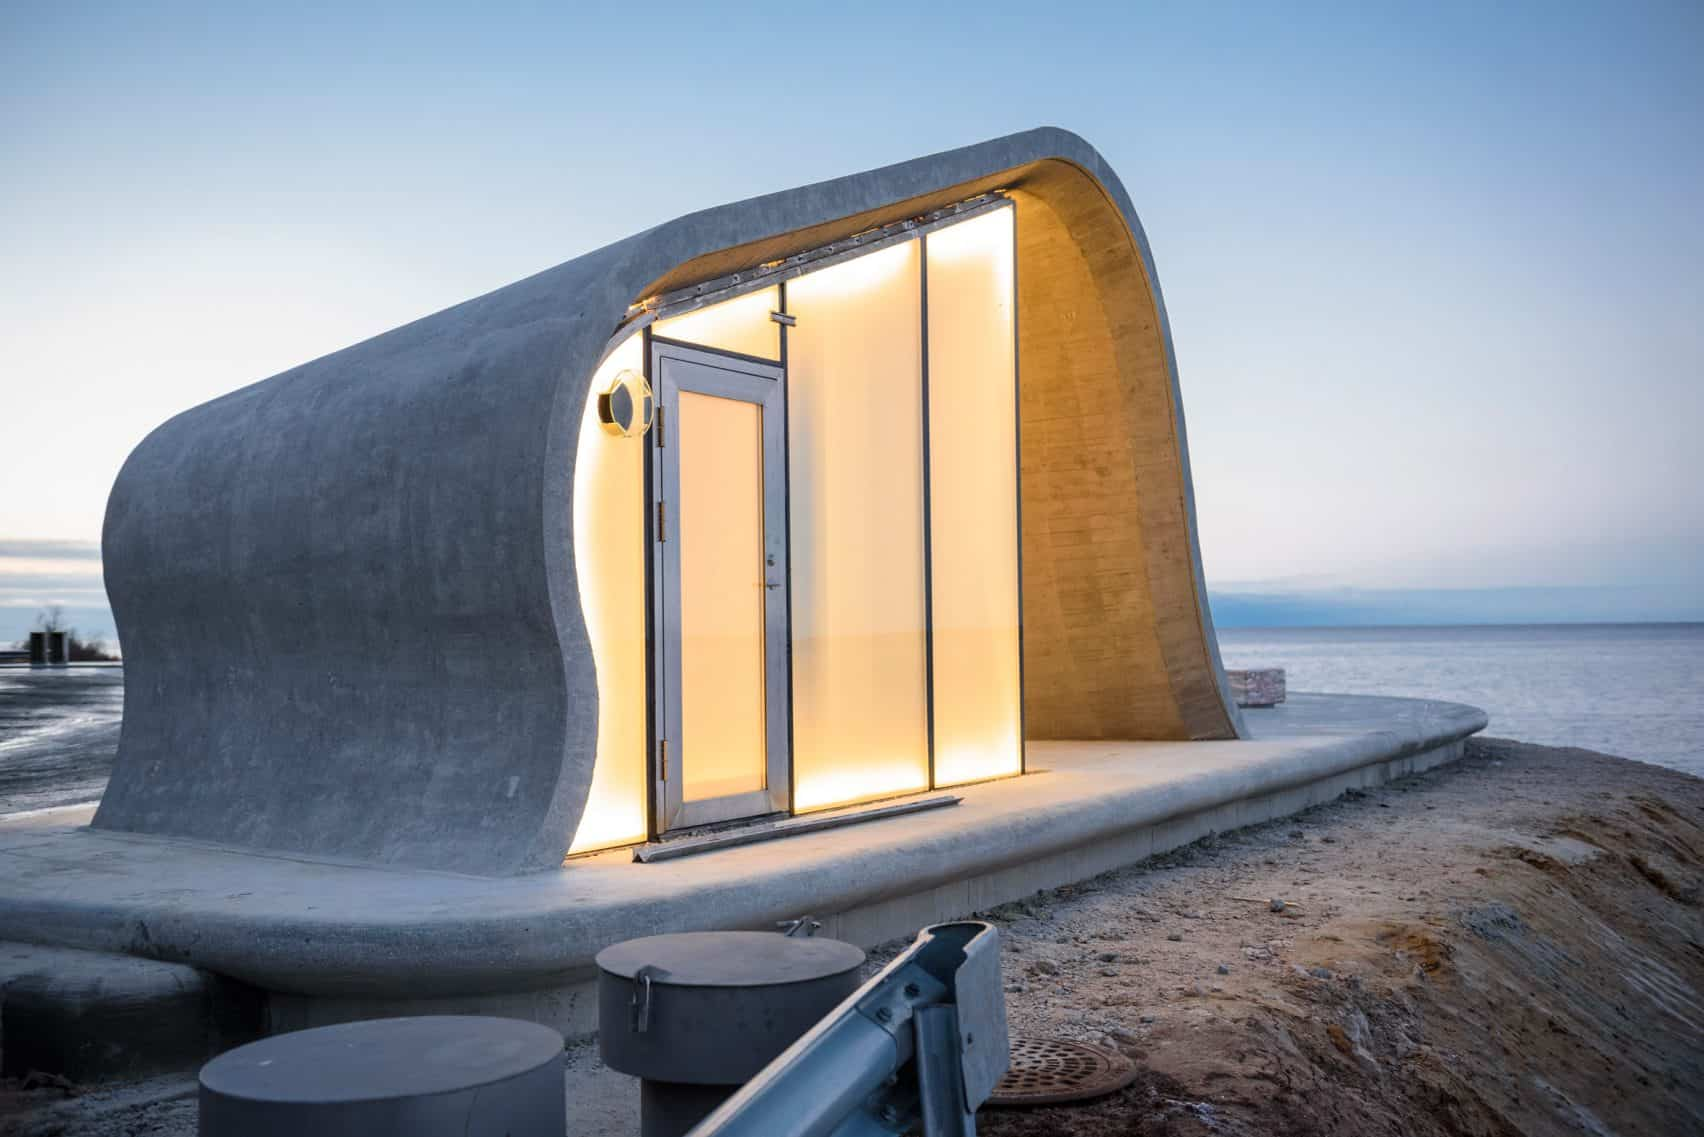 haugen zohar arkitekter hza wave shaped toilet facility norwegian scenic route 12